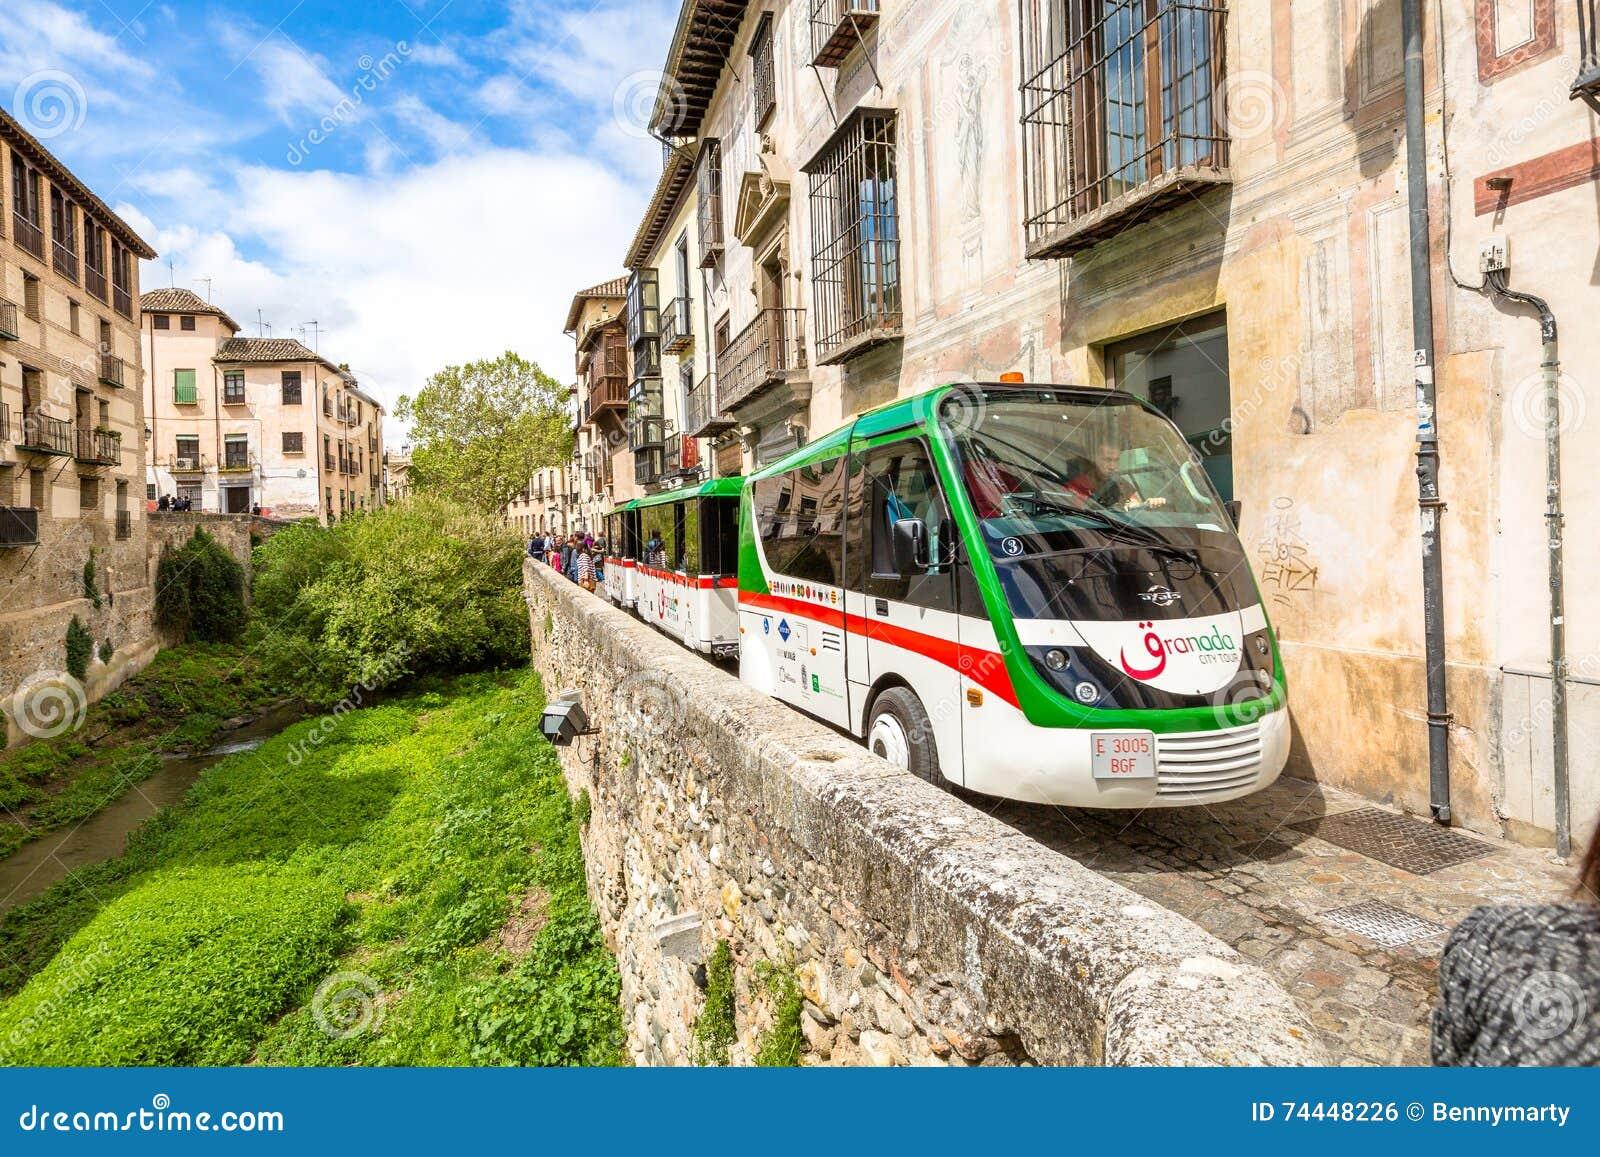 Albaicin quarter Granada editorial photo  Image of historic - 74448226